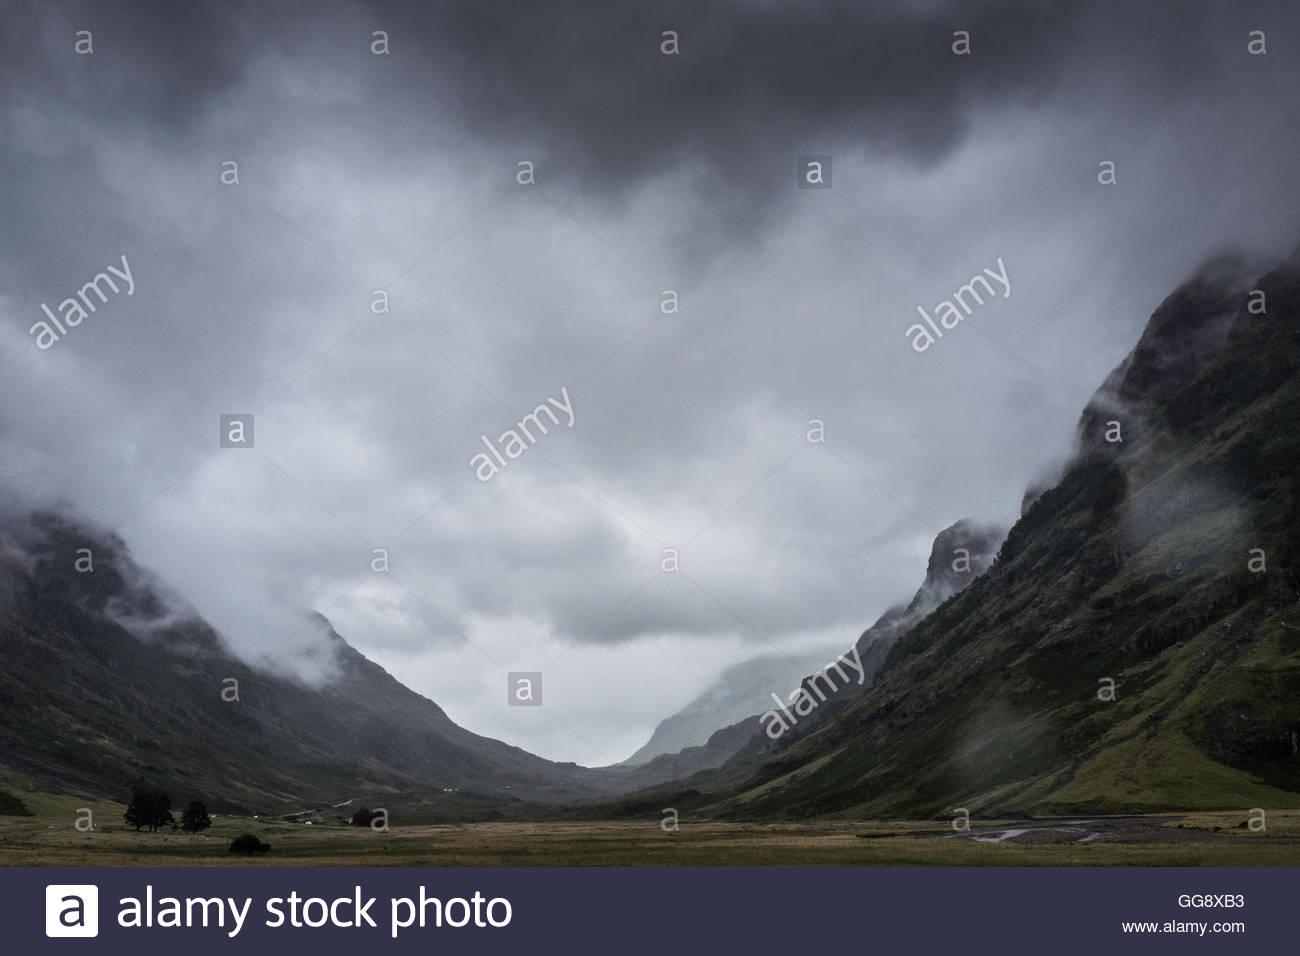 Glencoe, Ballachulish, Scottish Highlands, UK. 10th August 2016. Low clouds and rainfall drape the the dramtic landscape - Stock Image